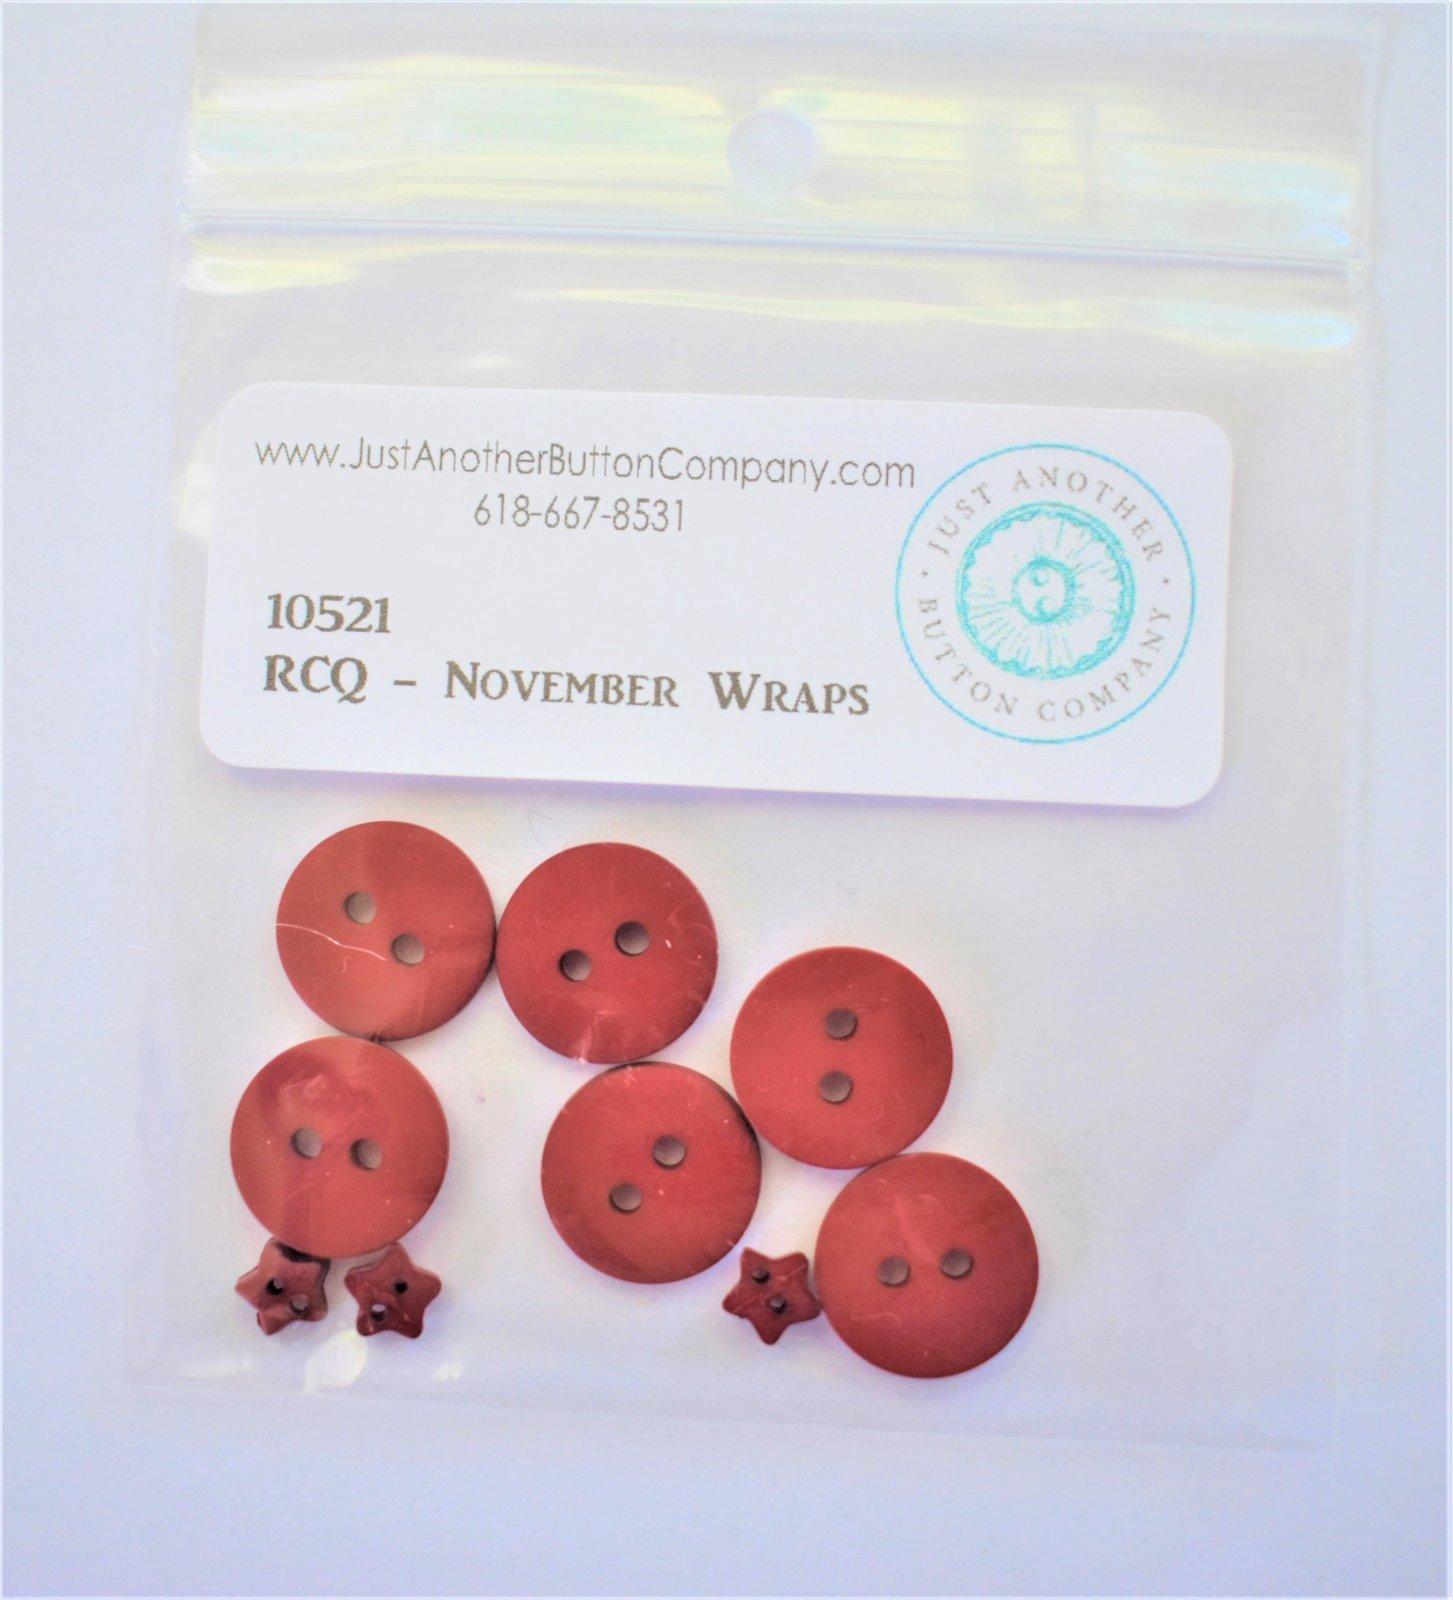 November Wraps - button pack